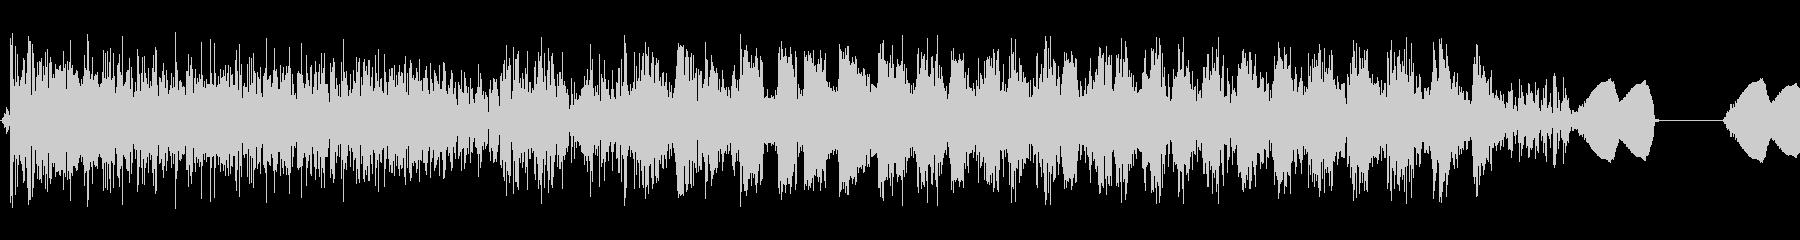 SciFi EC01_90_4の未再生の波形